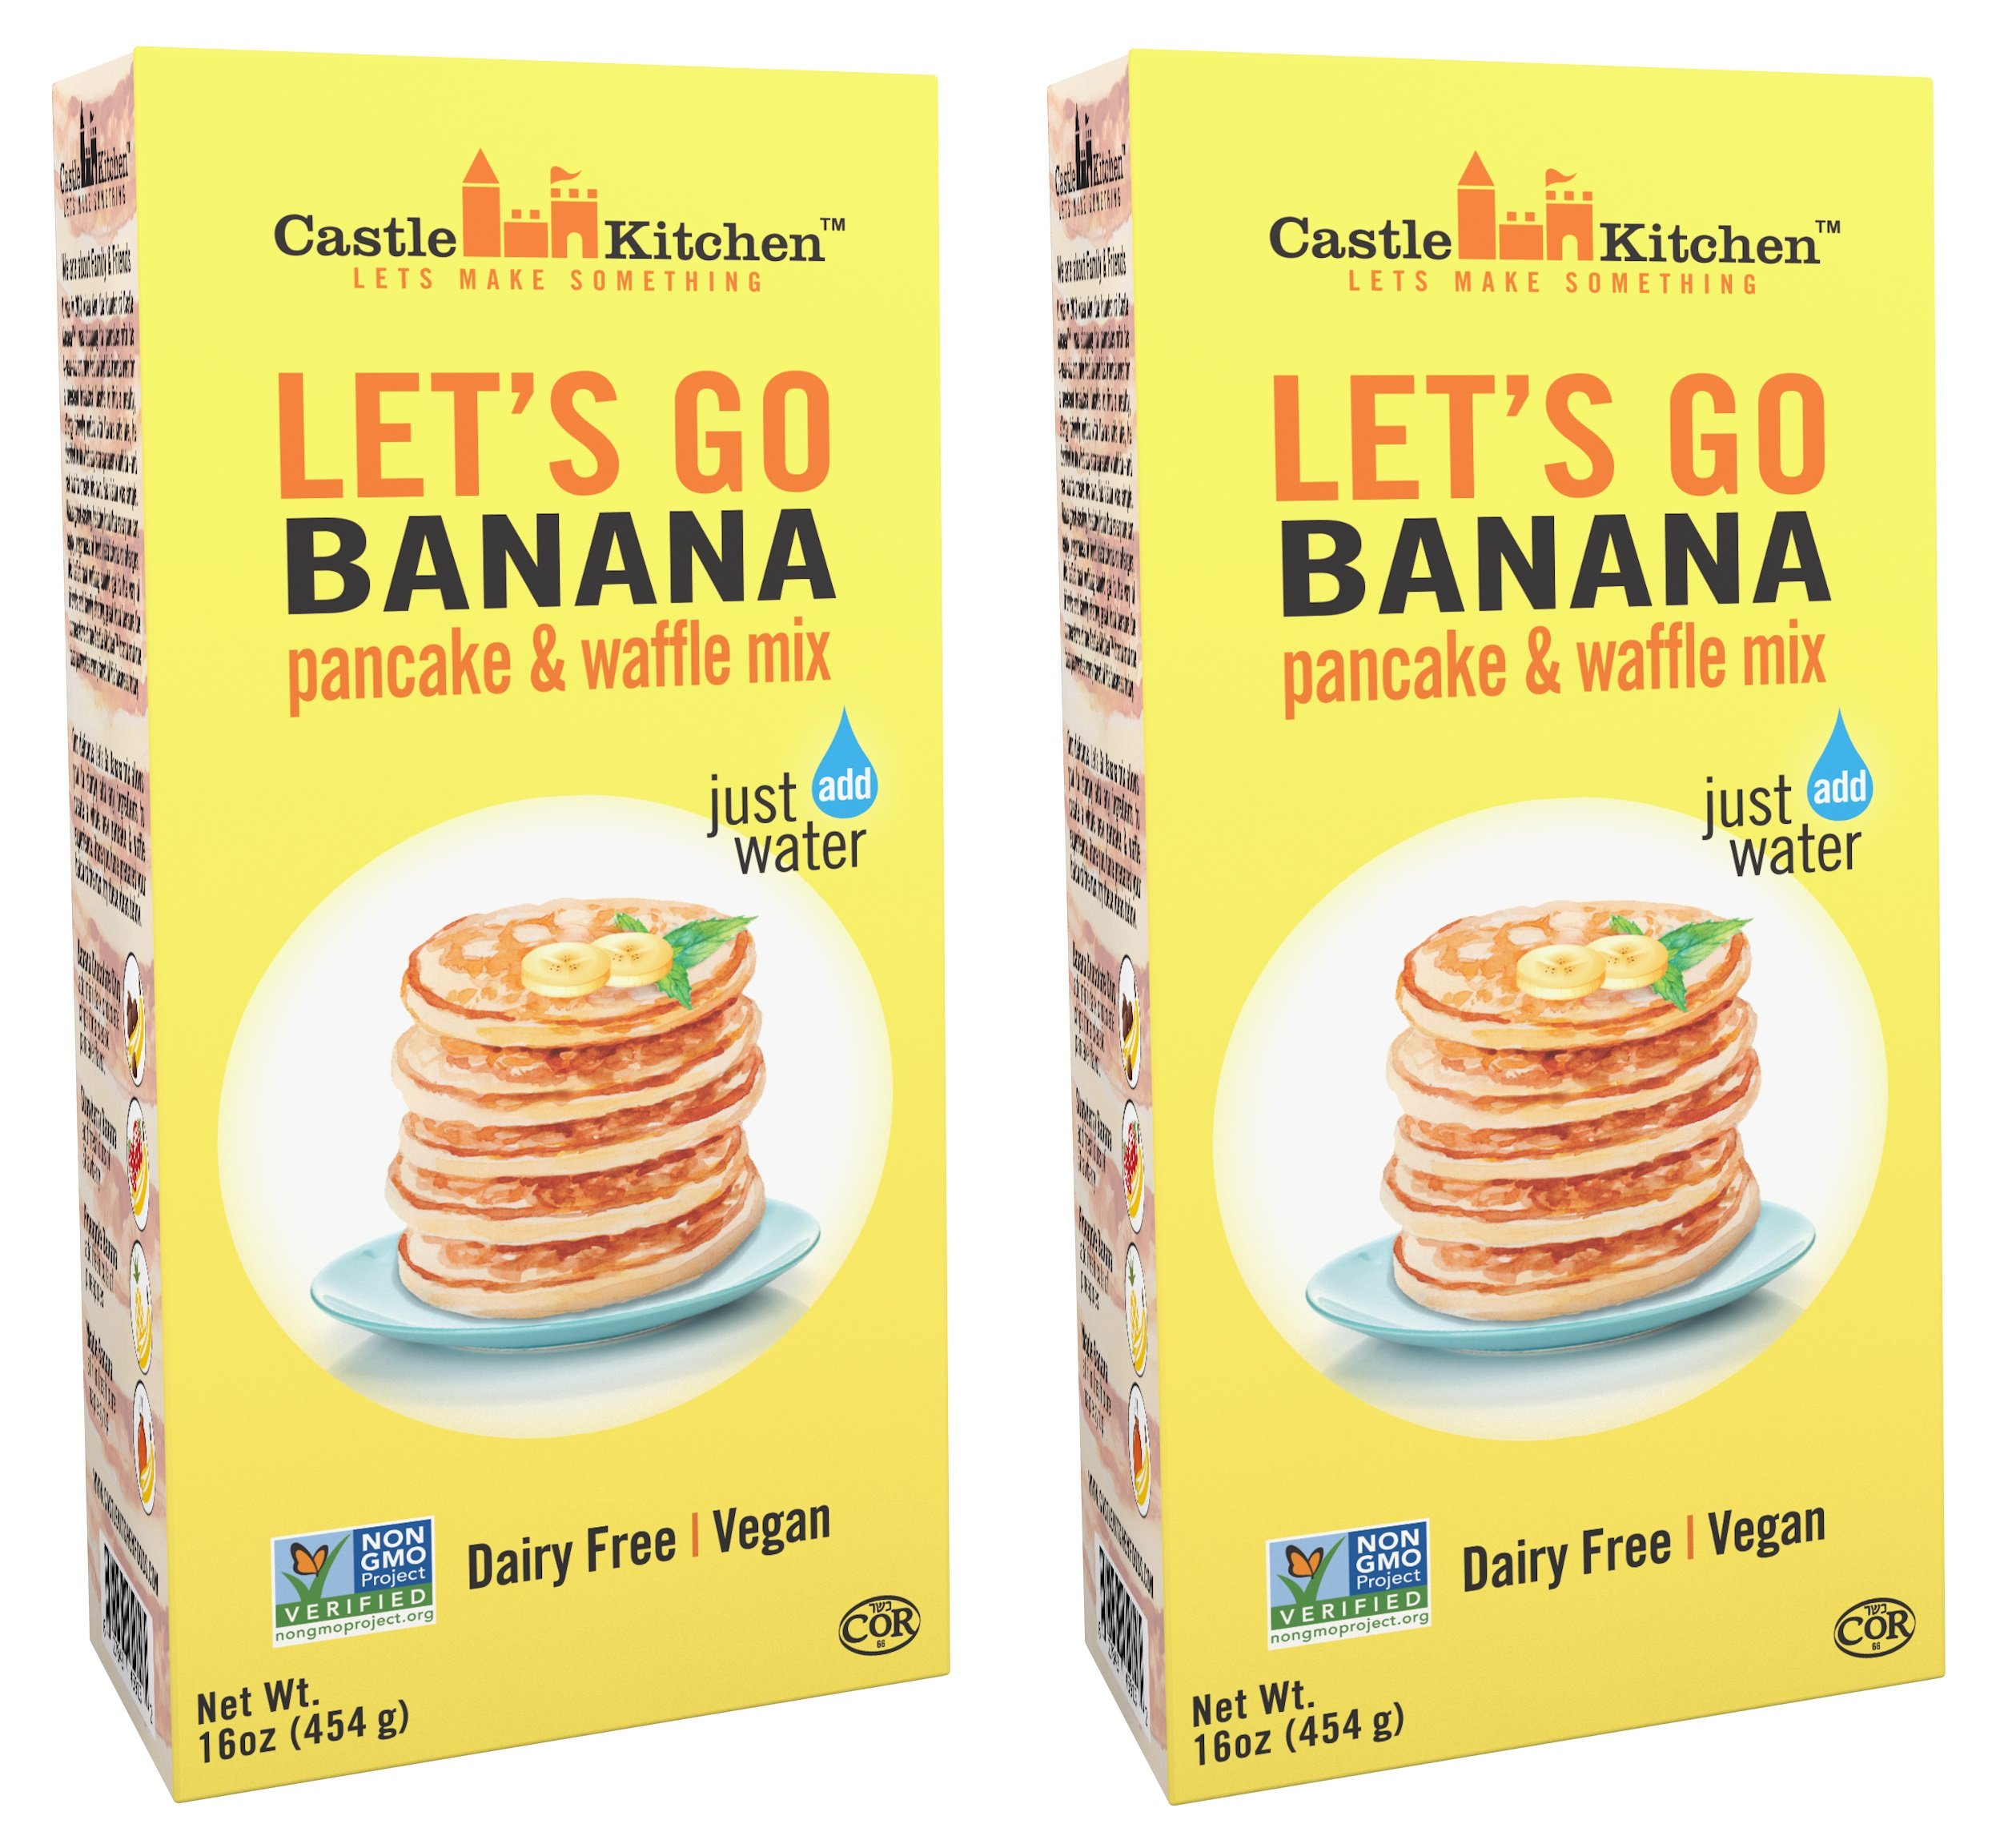 Banana Pancake Mix - Let's Go Banana Dairy-Free, Vegan Complete Pancake & Waffle Mix - Just Add Water - 16 oz (Pack of 2)